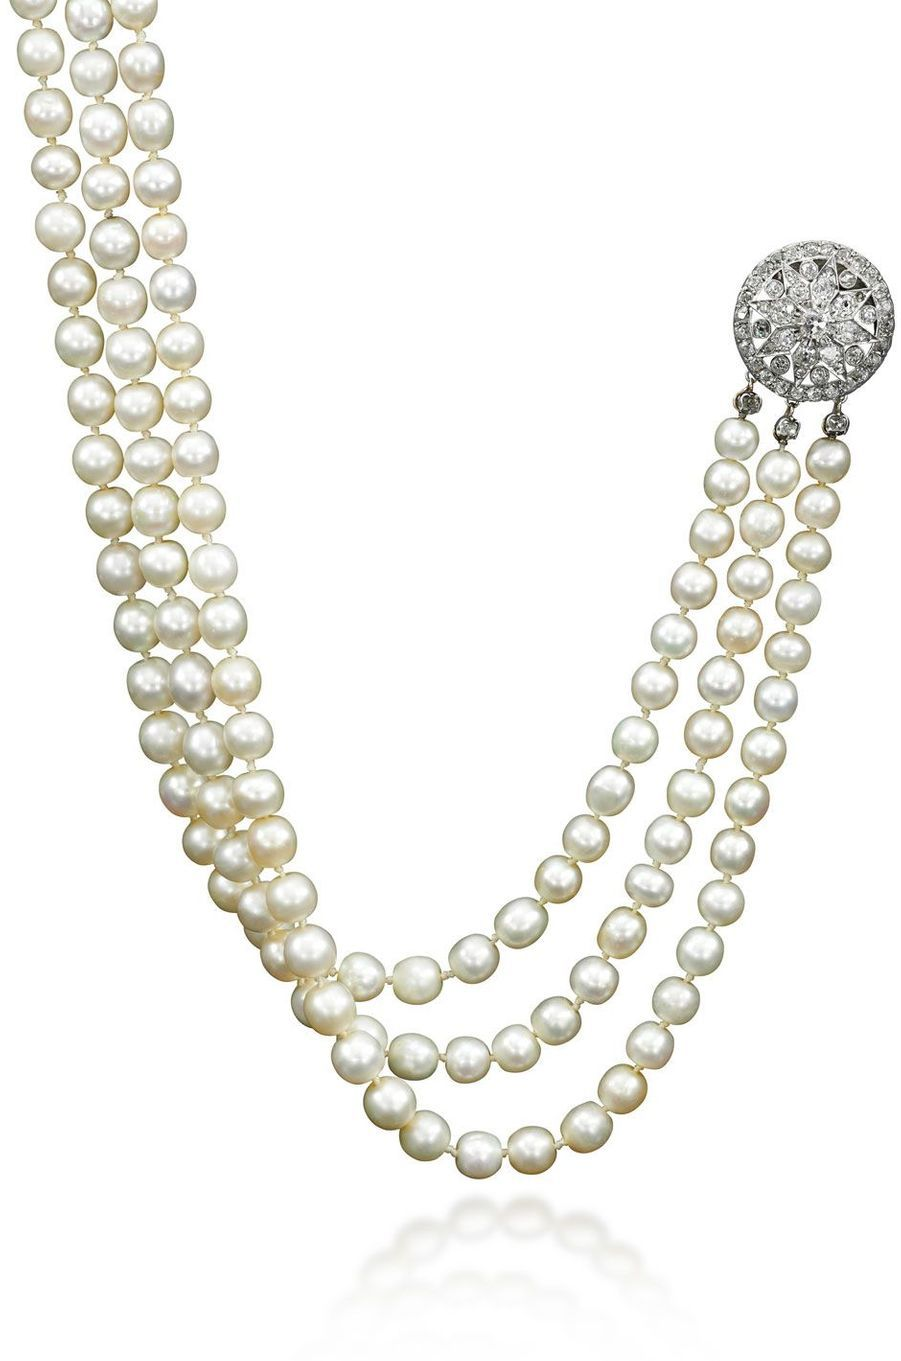 Bijoux de Marie-Antoinette : collier trois rangs en perles et diamants